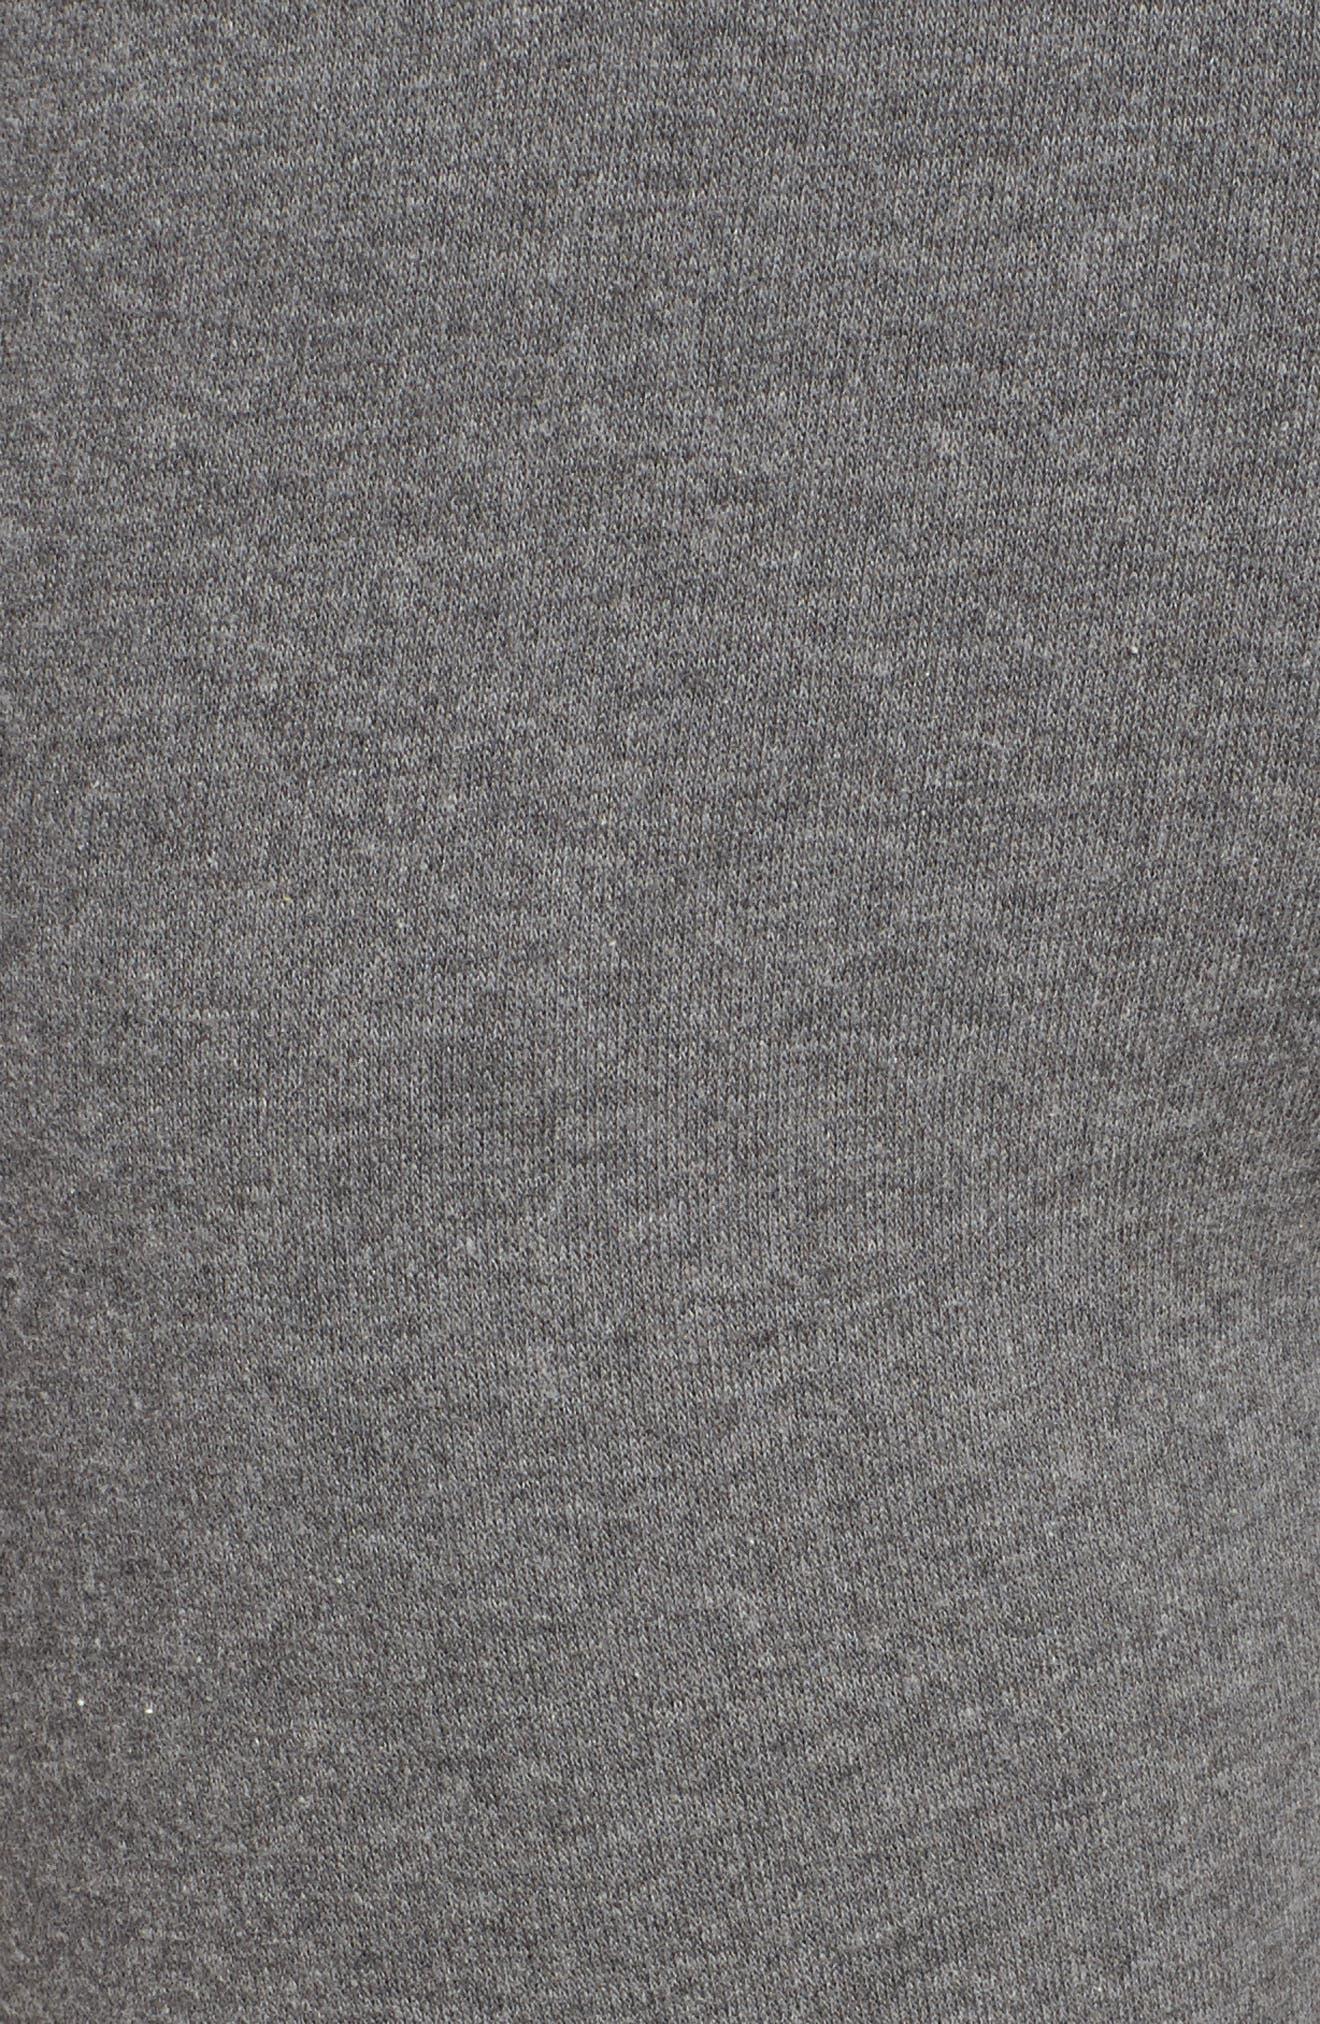 Crop Flare Sweatpants,                             Alternate thumbnail 5, color,                             020